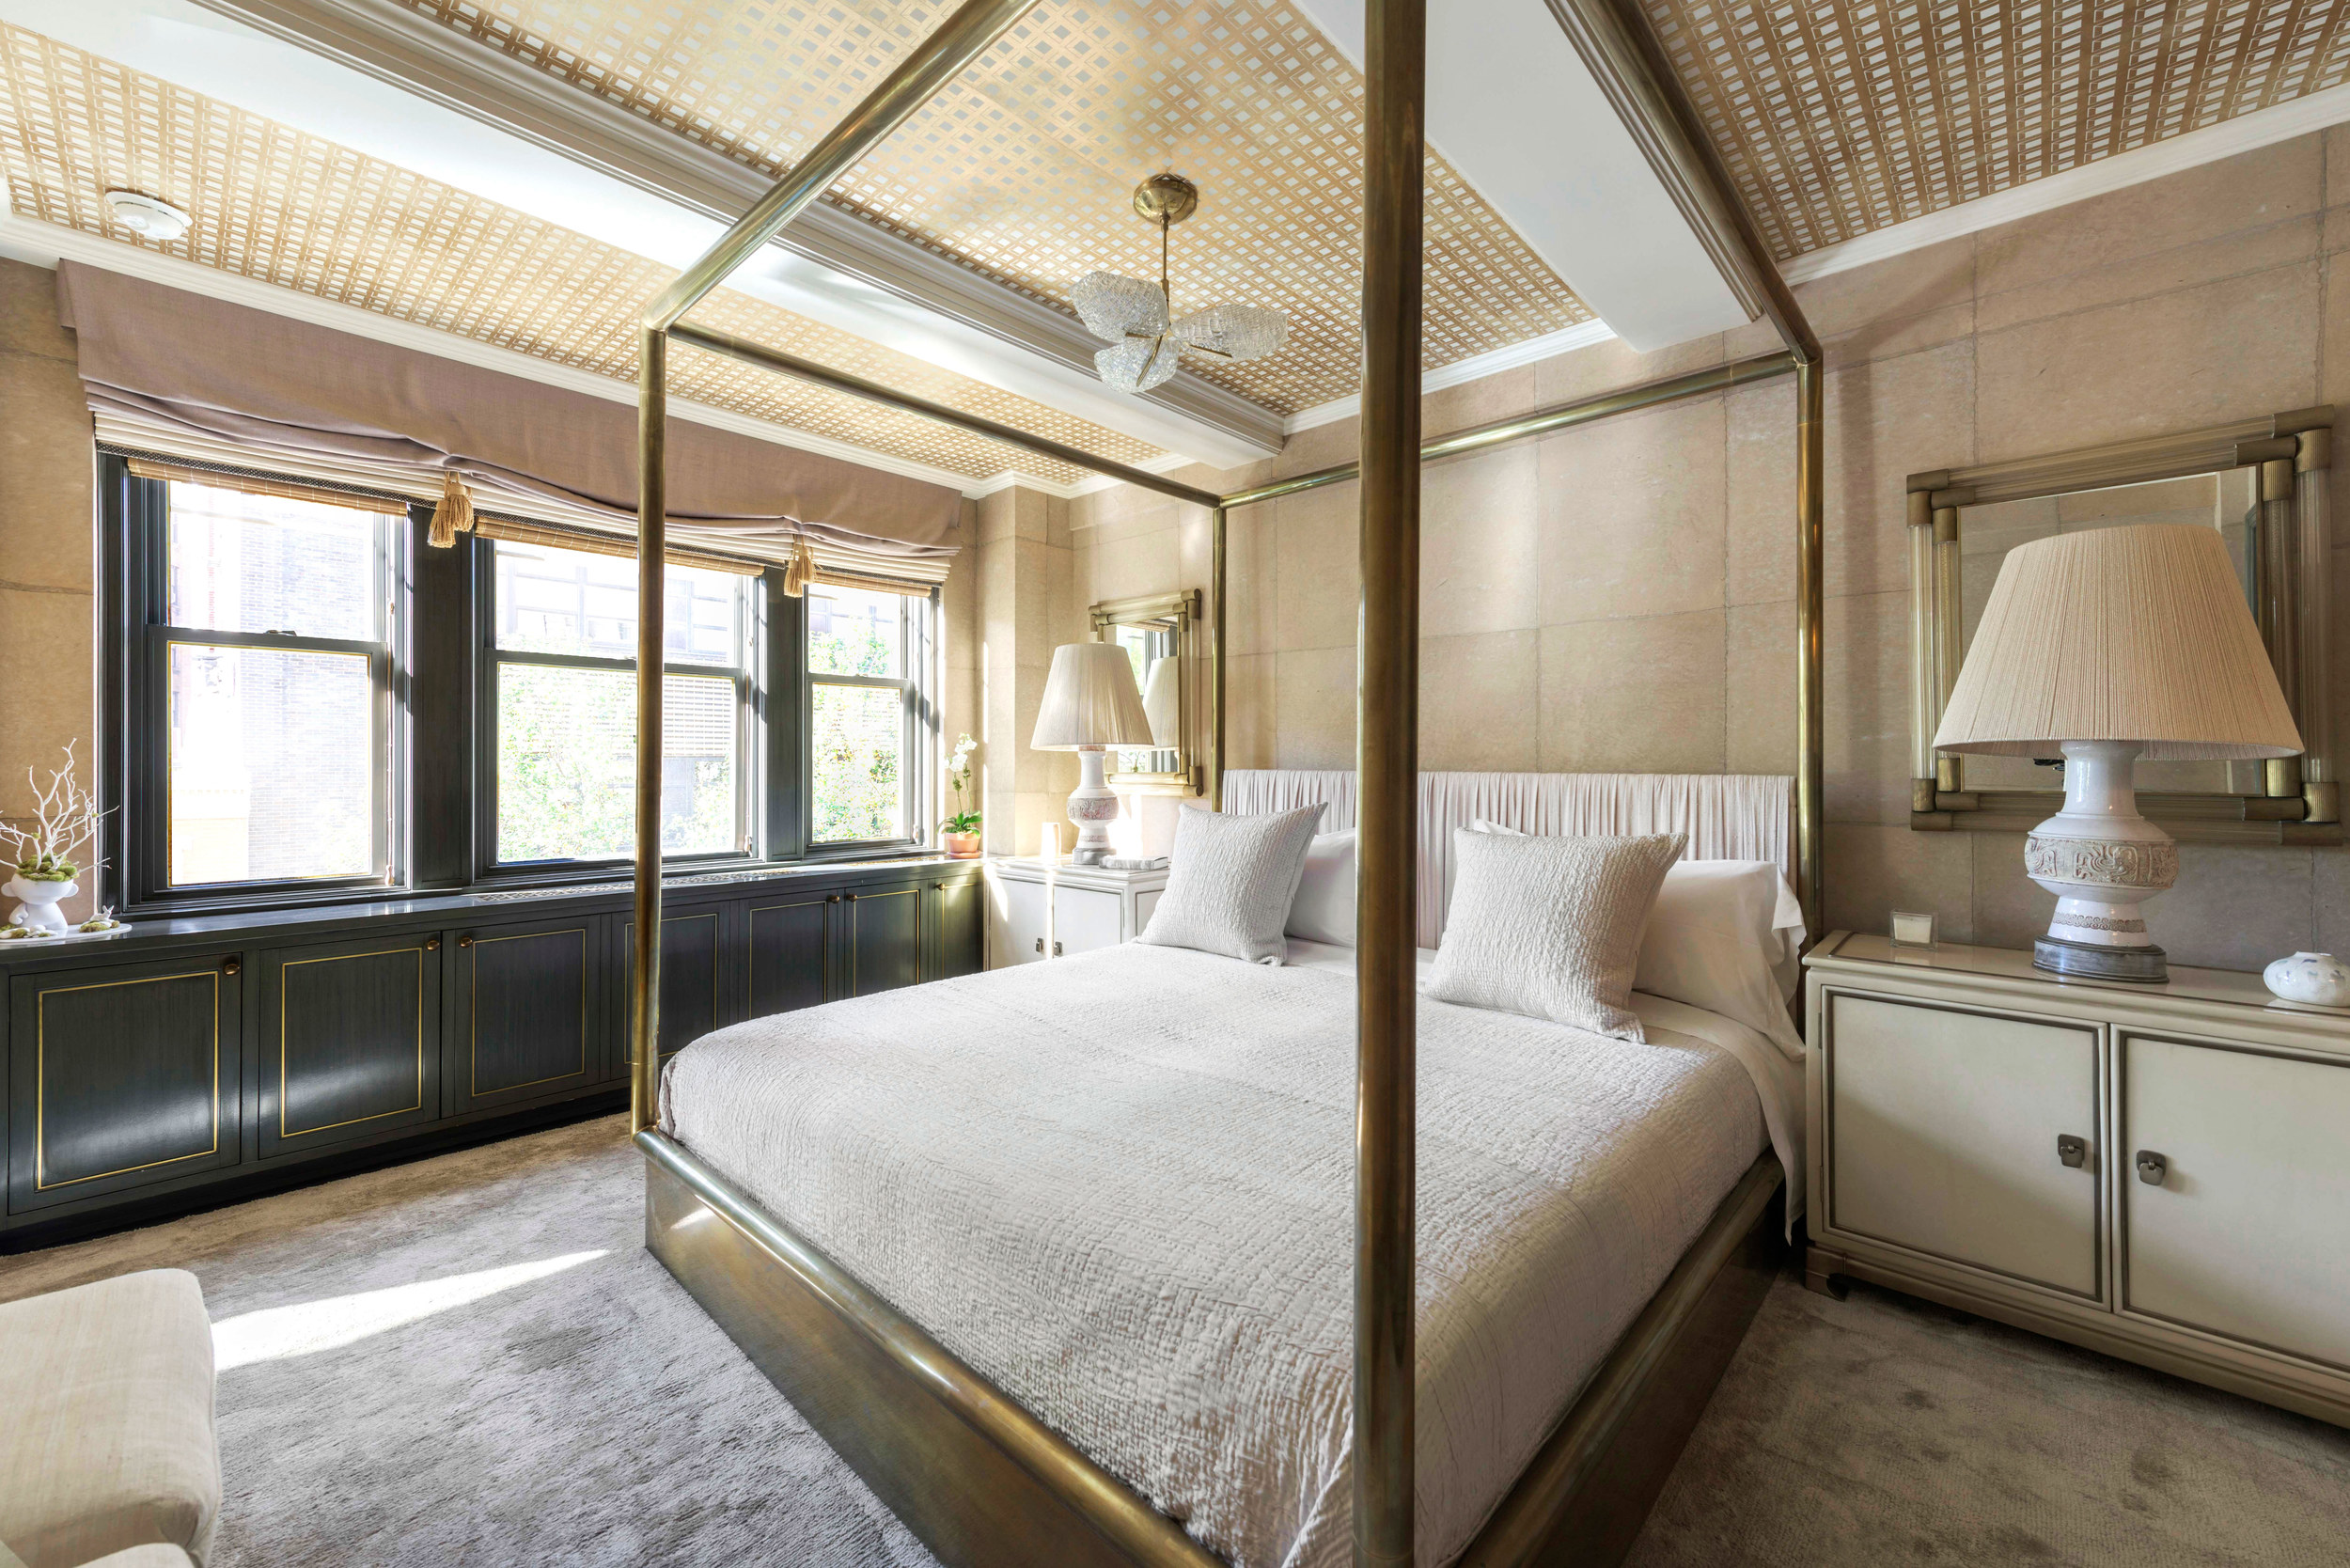 cameron-diaz-greenwich-village-apartment-on-sale-warburg-realty-04.jpg